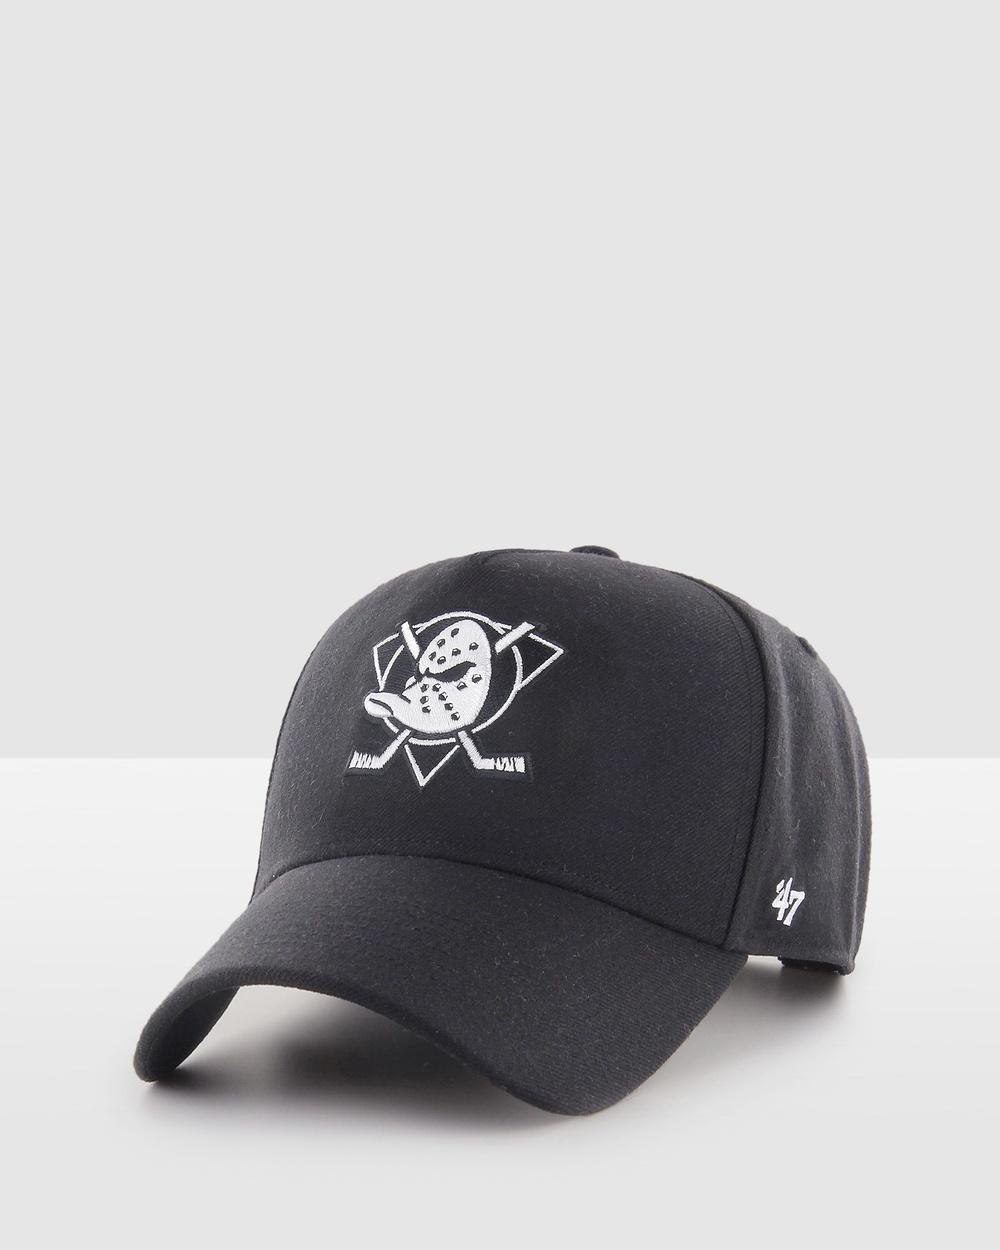 47 Anaheim Ducks Replica black '47 MVP DT Snapback Hats black